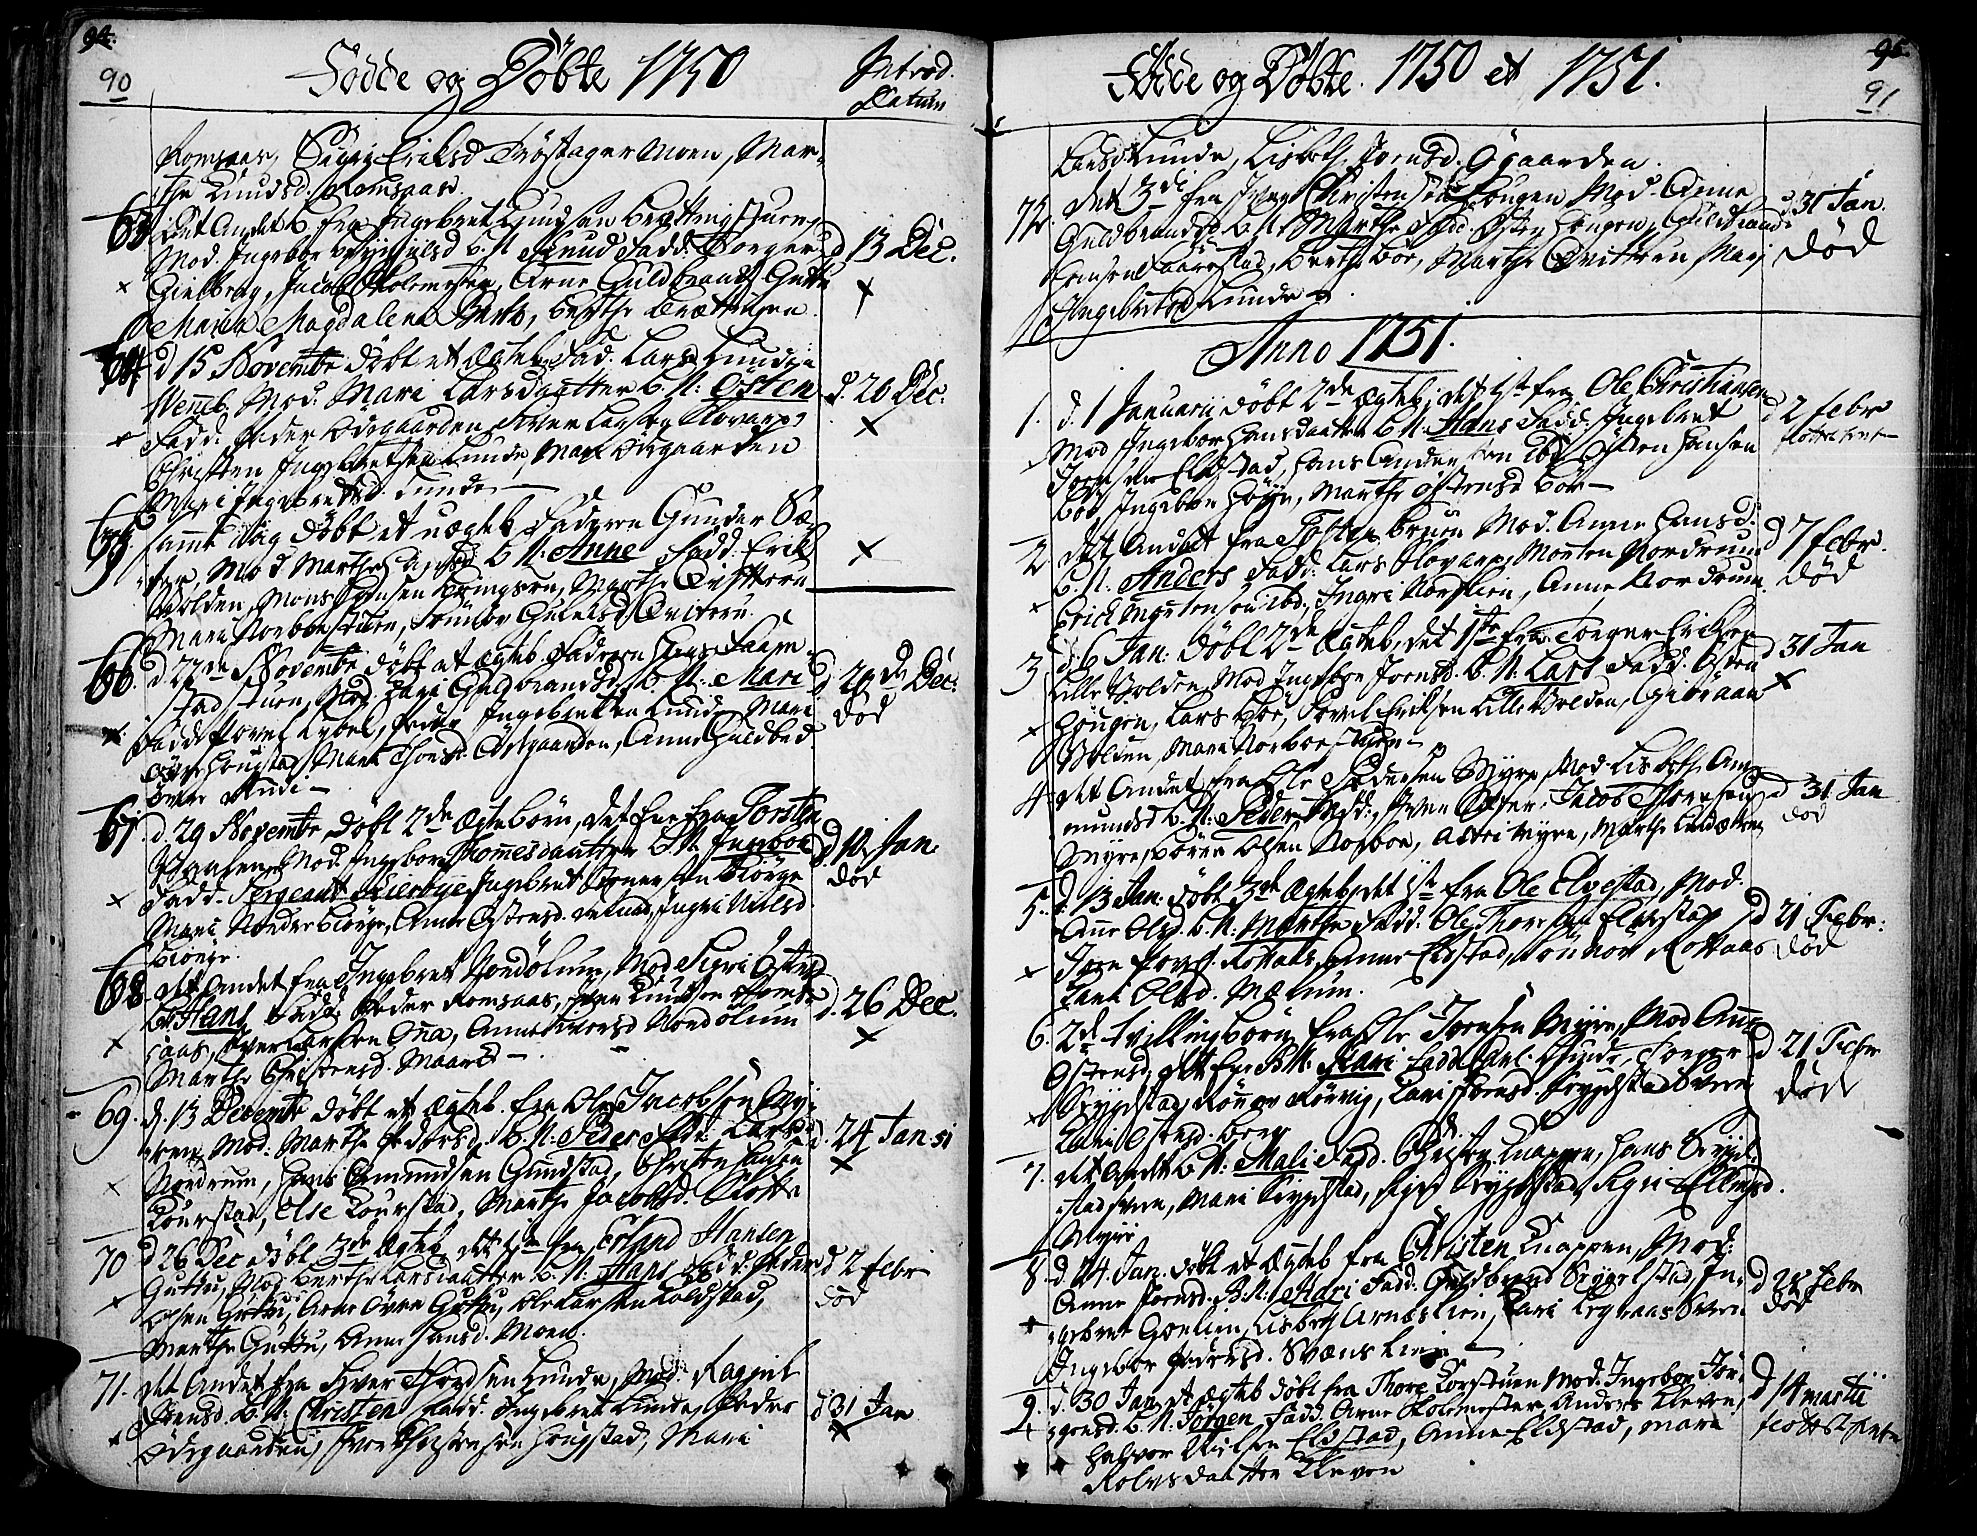 SAH, Ringebu prestekontor, Ministerialbok nr. 2, 1734-1780, s. 90-91